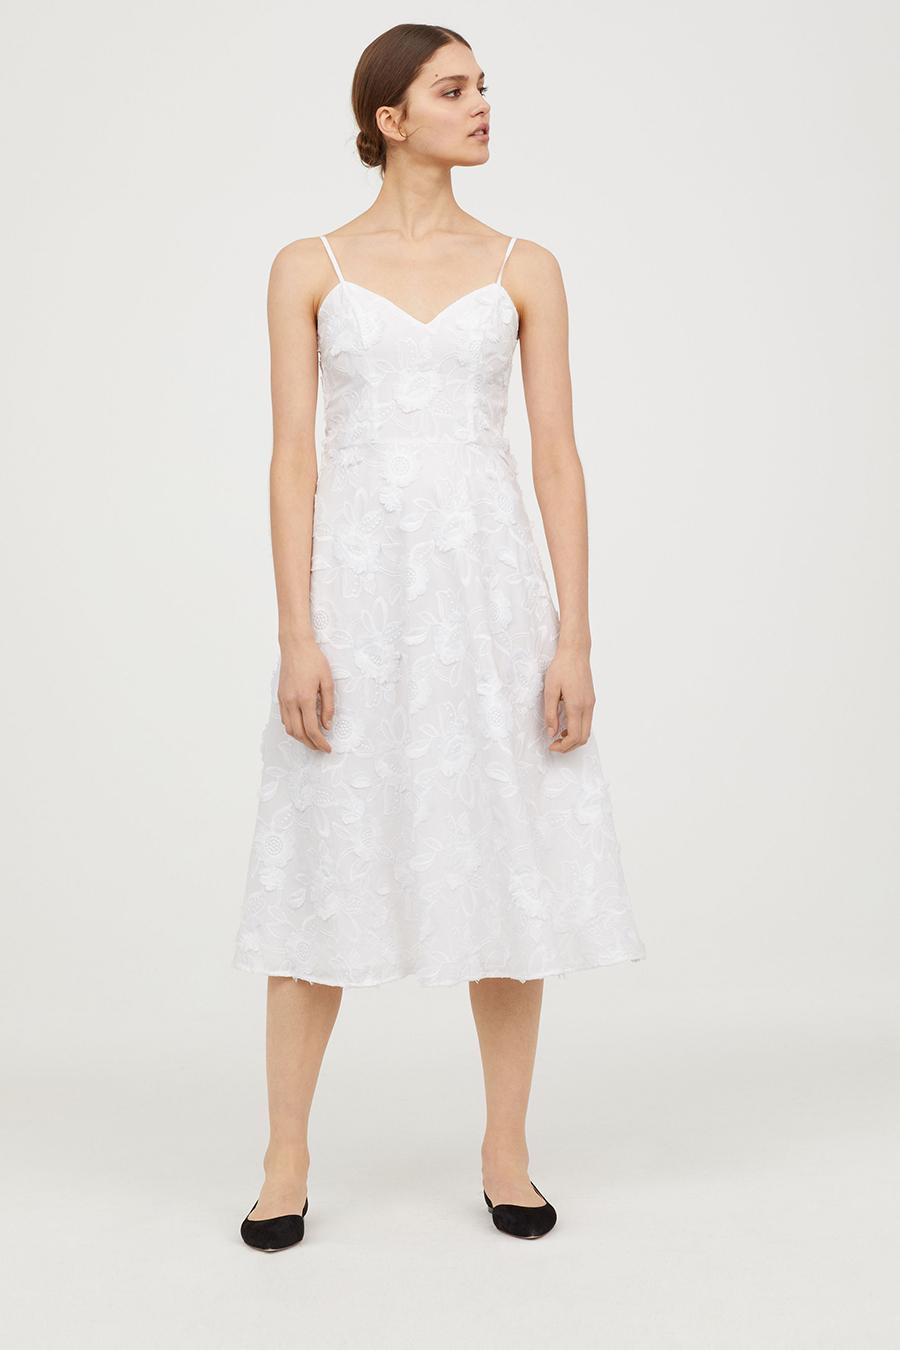 cba53fd83 354 Fotos de vestidos de novia - Pagina 3